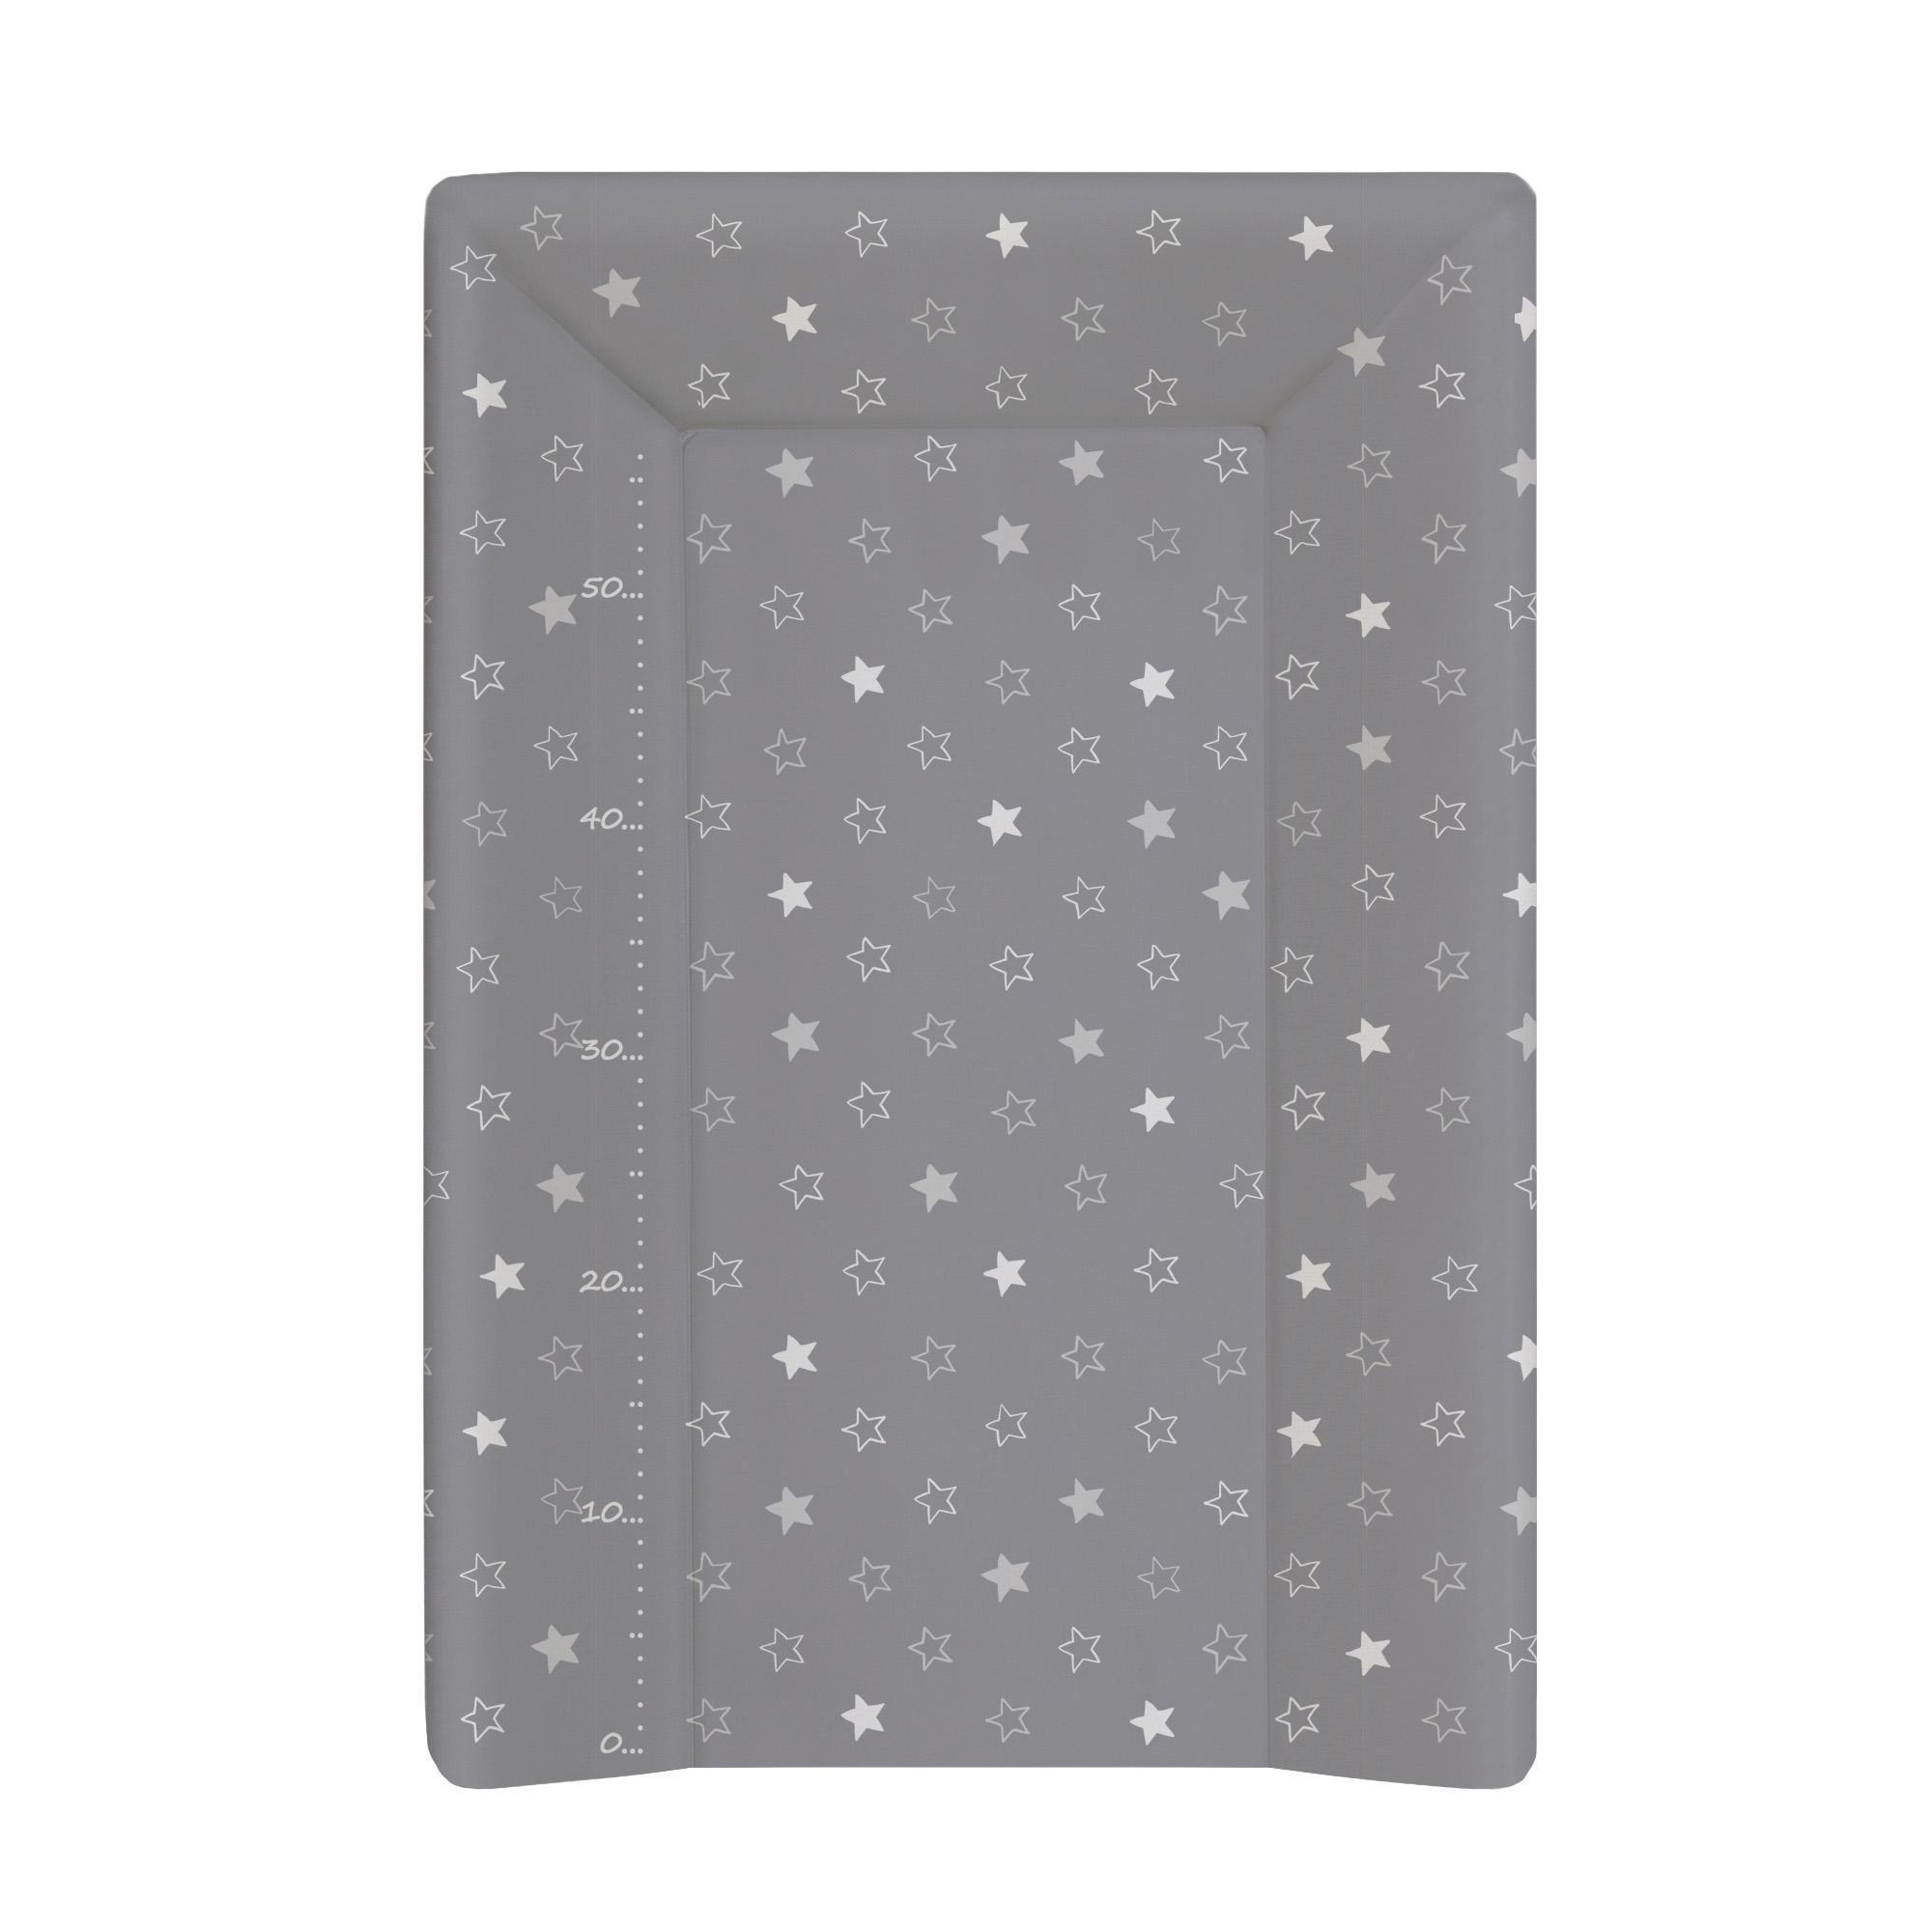 Pārtinamā virsma ar ierobežojumu 70 cm CEBA BABY STARS dark grey 201